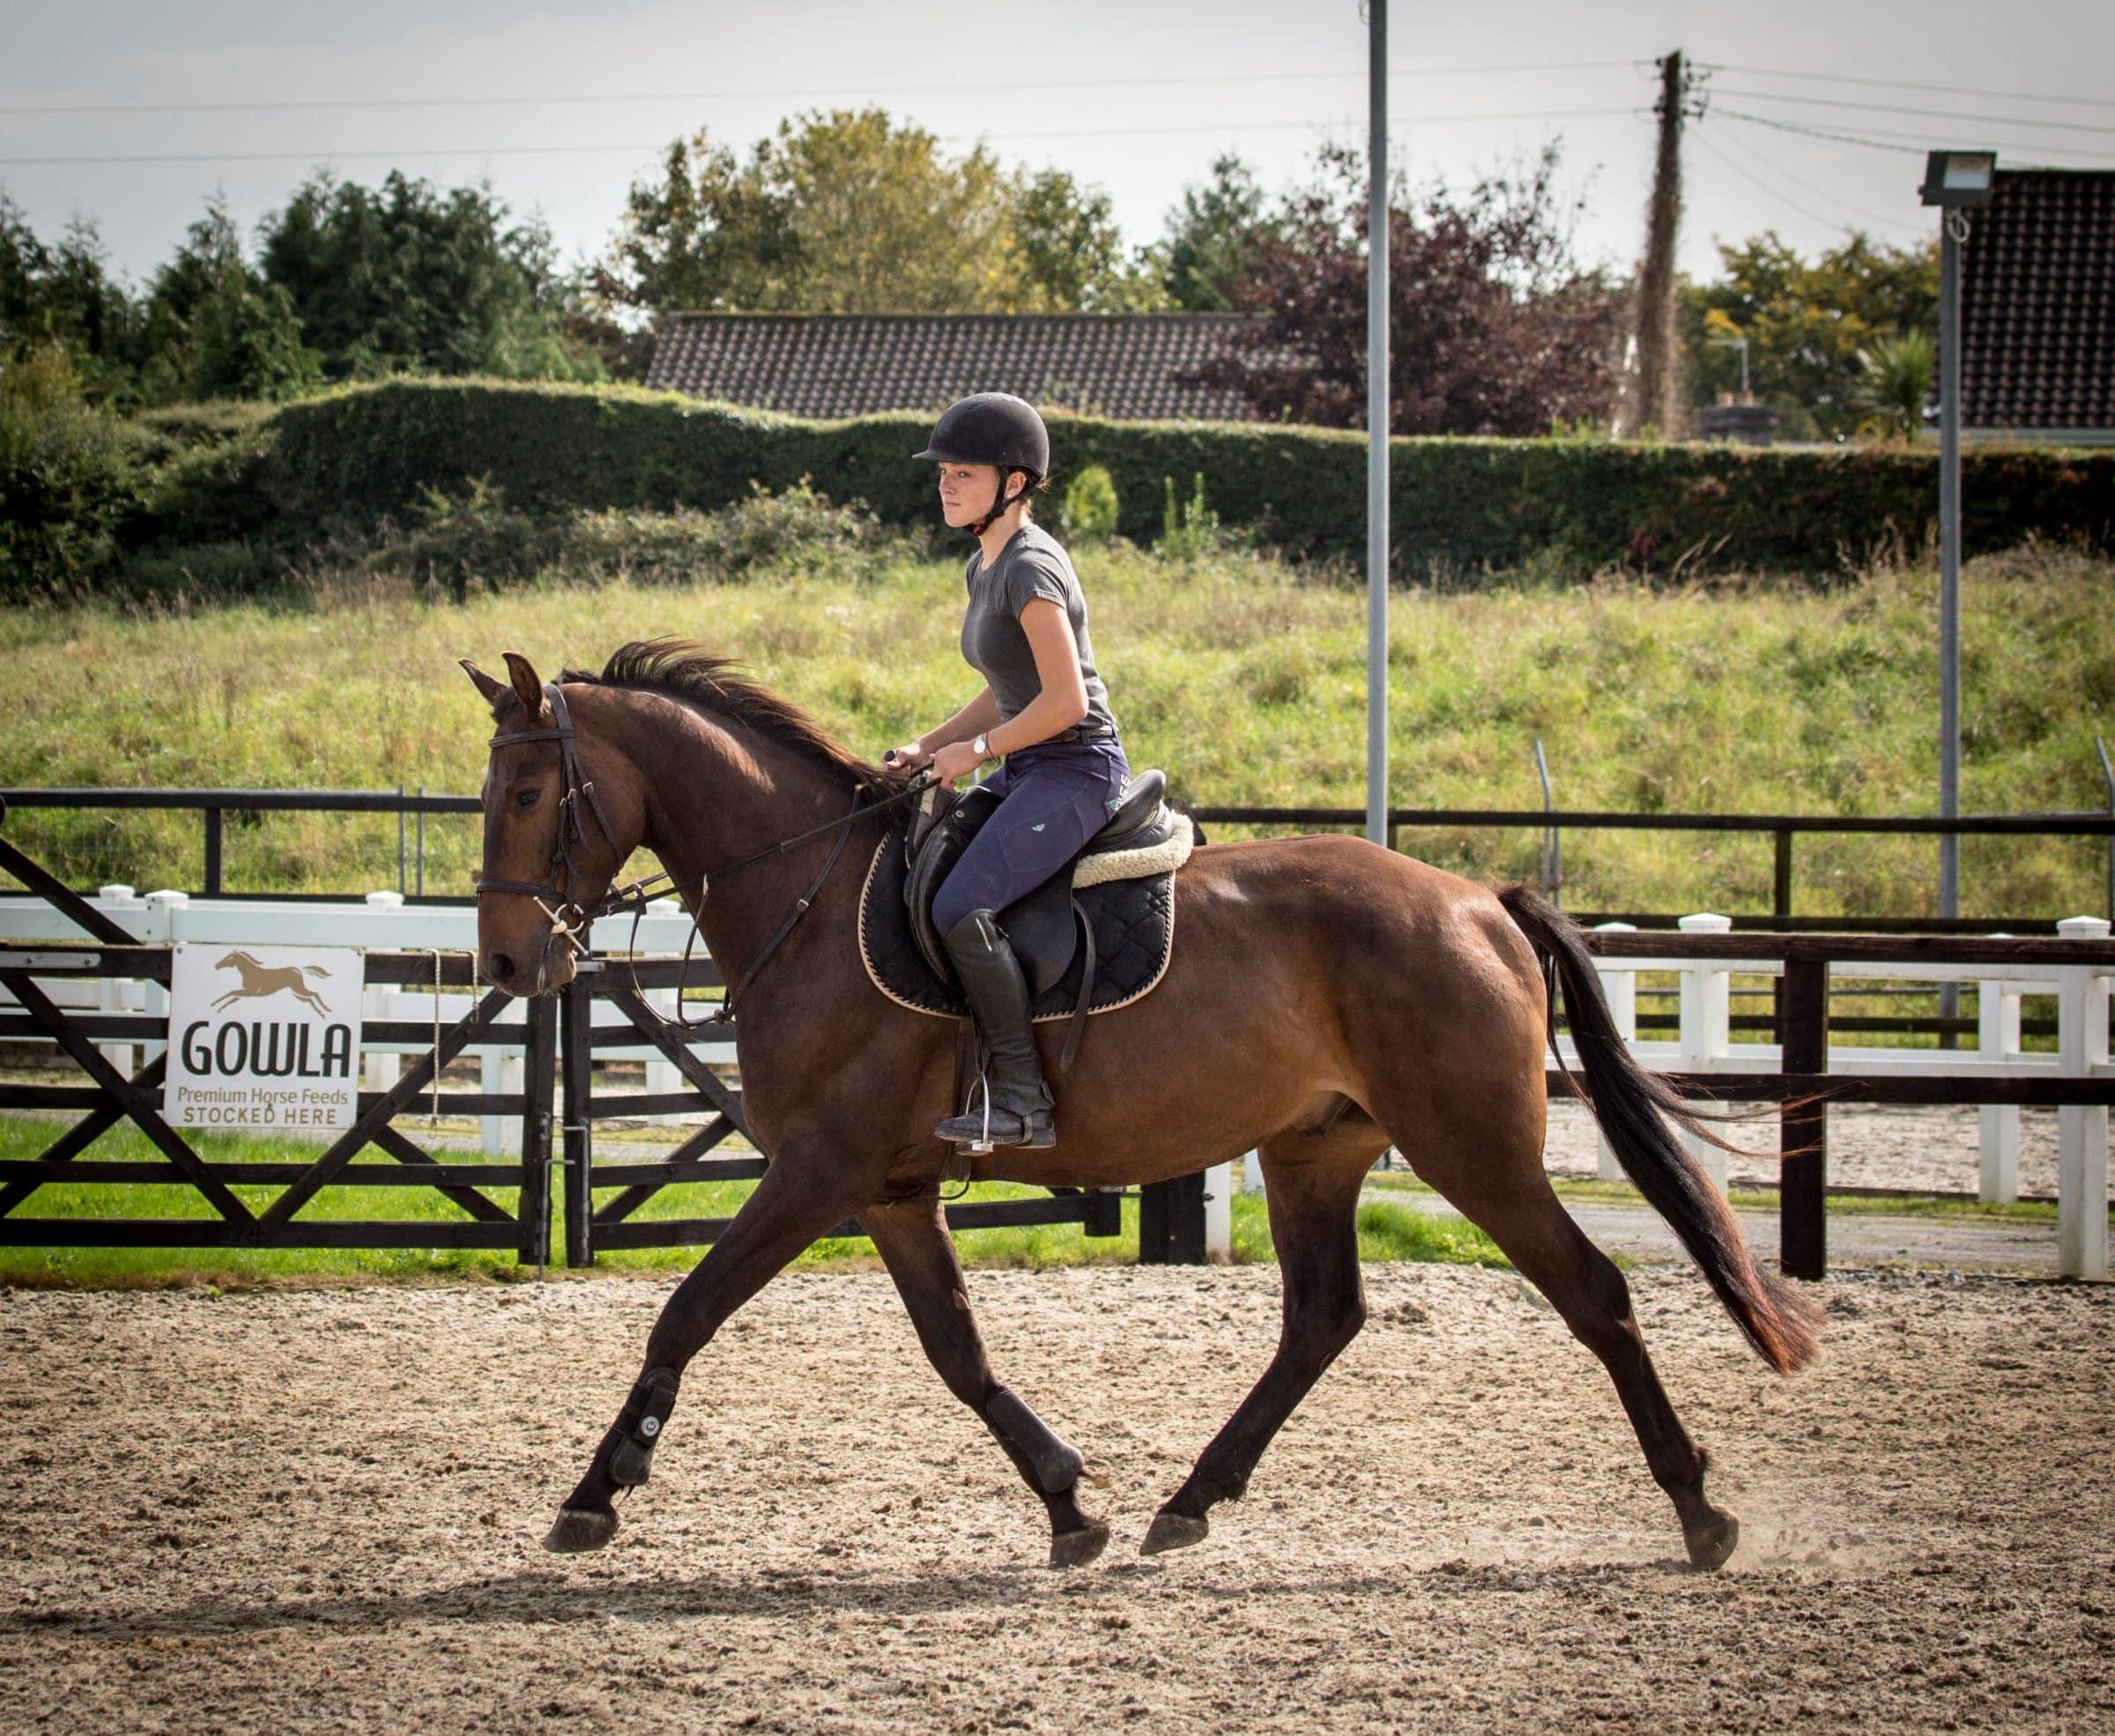 Horses-for-sale-Irish-Sporthorse-Allrounder-Jumper-Eventer-Dressage